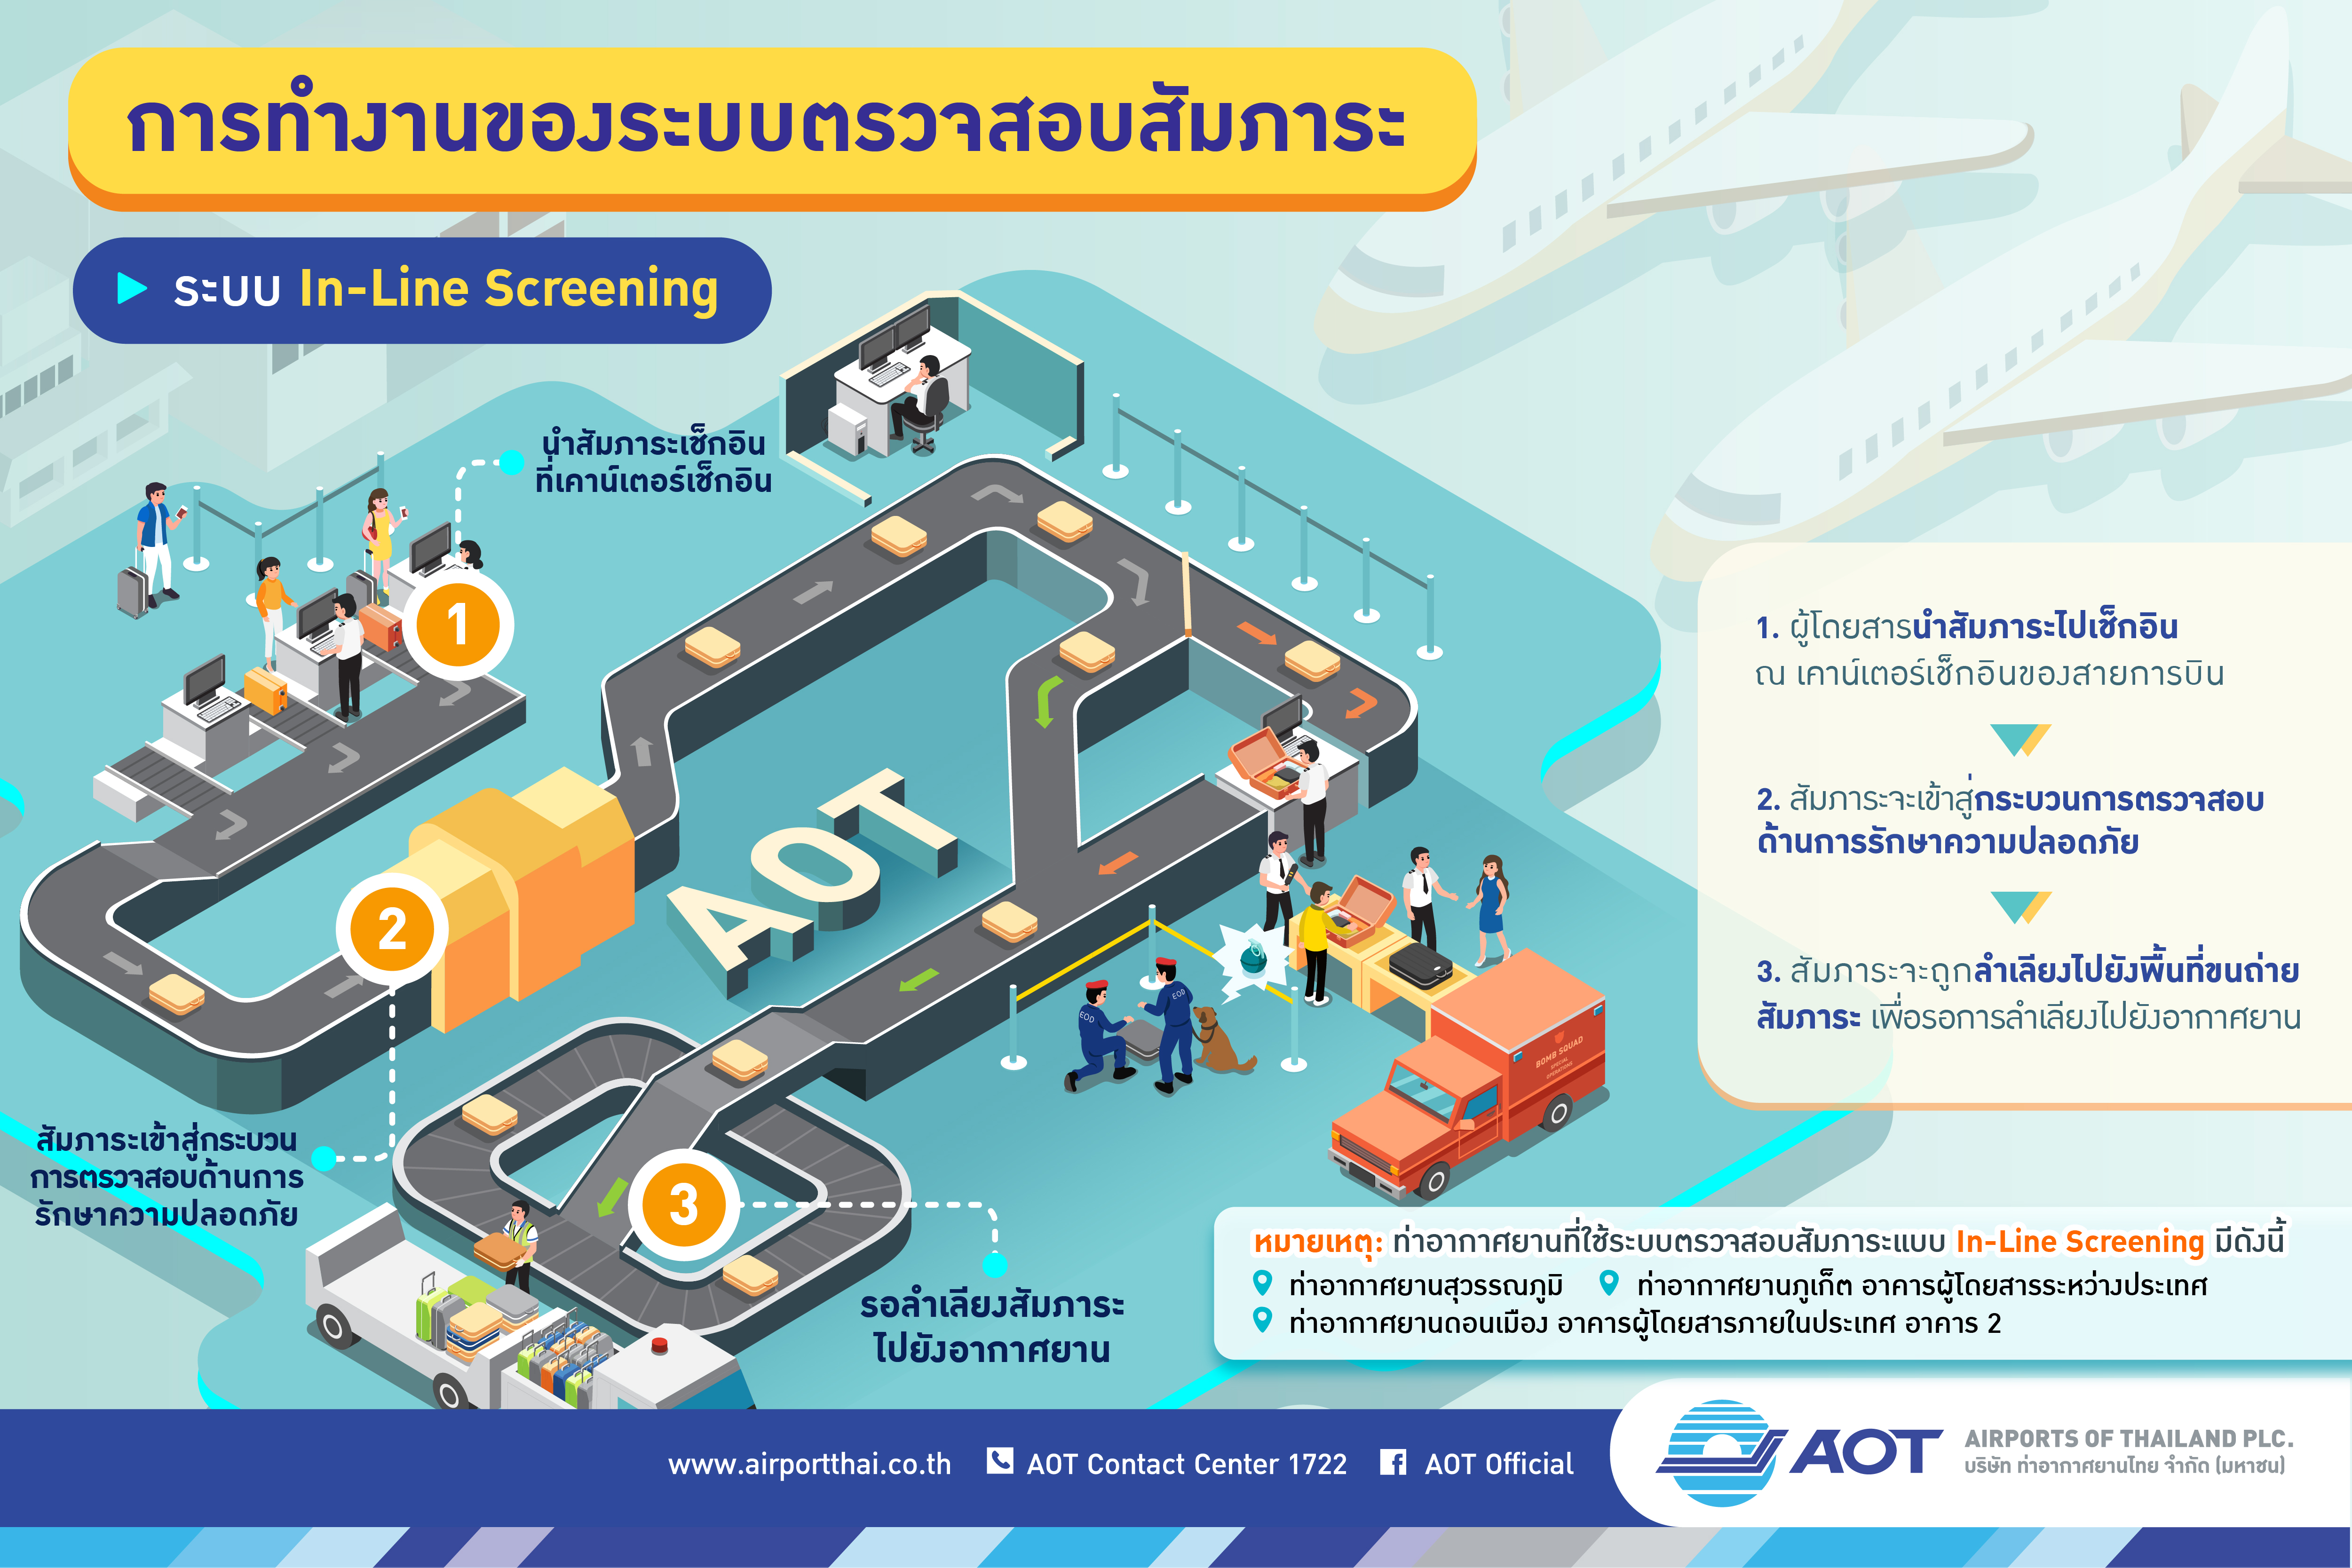 AOT_infographic11_Baggage Handling System_V.20_190621-02